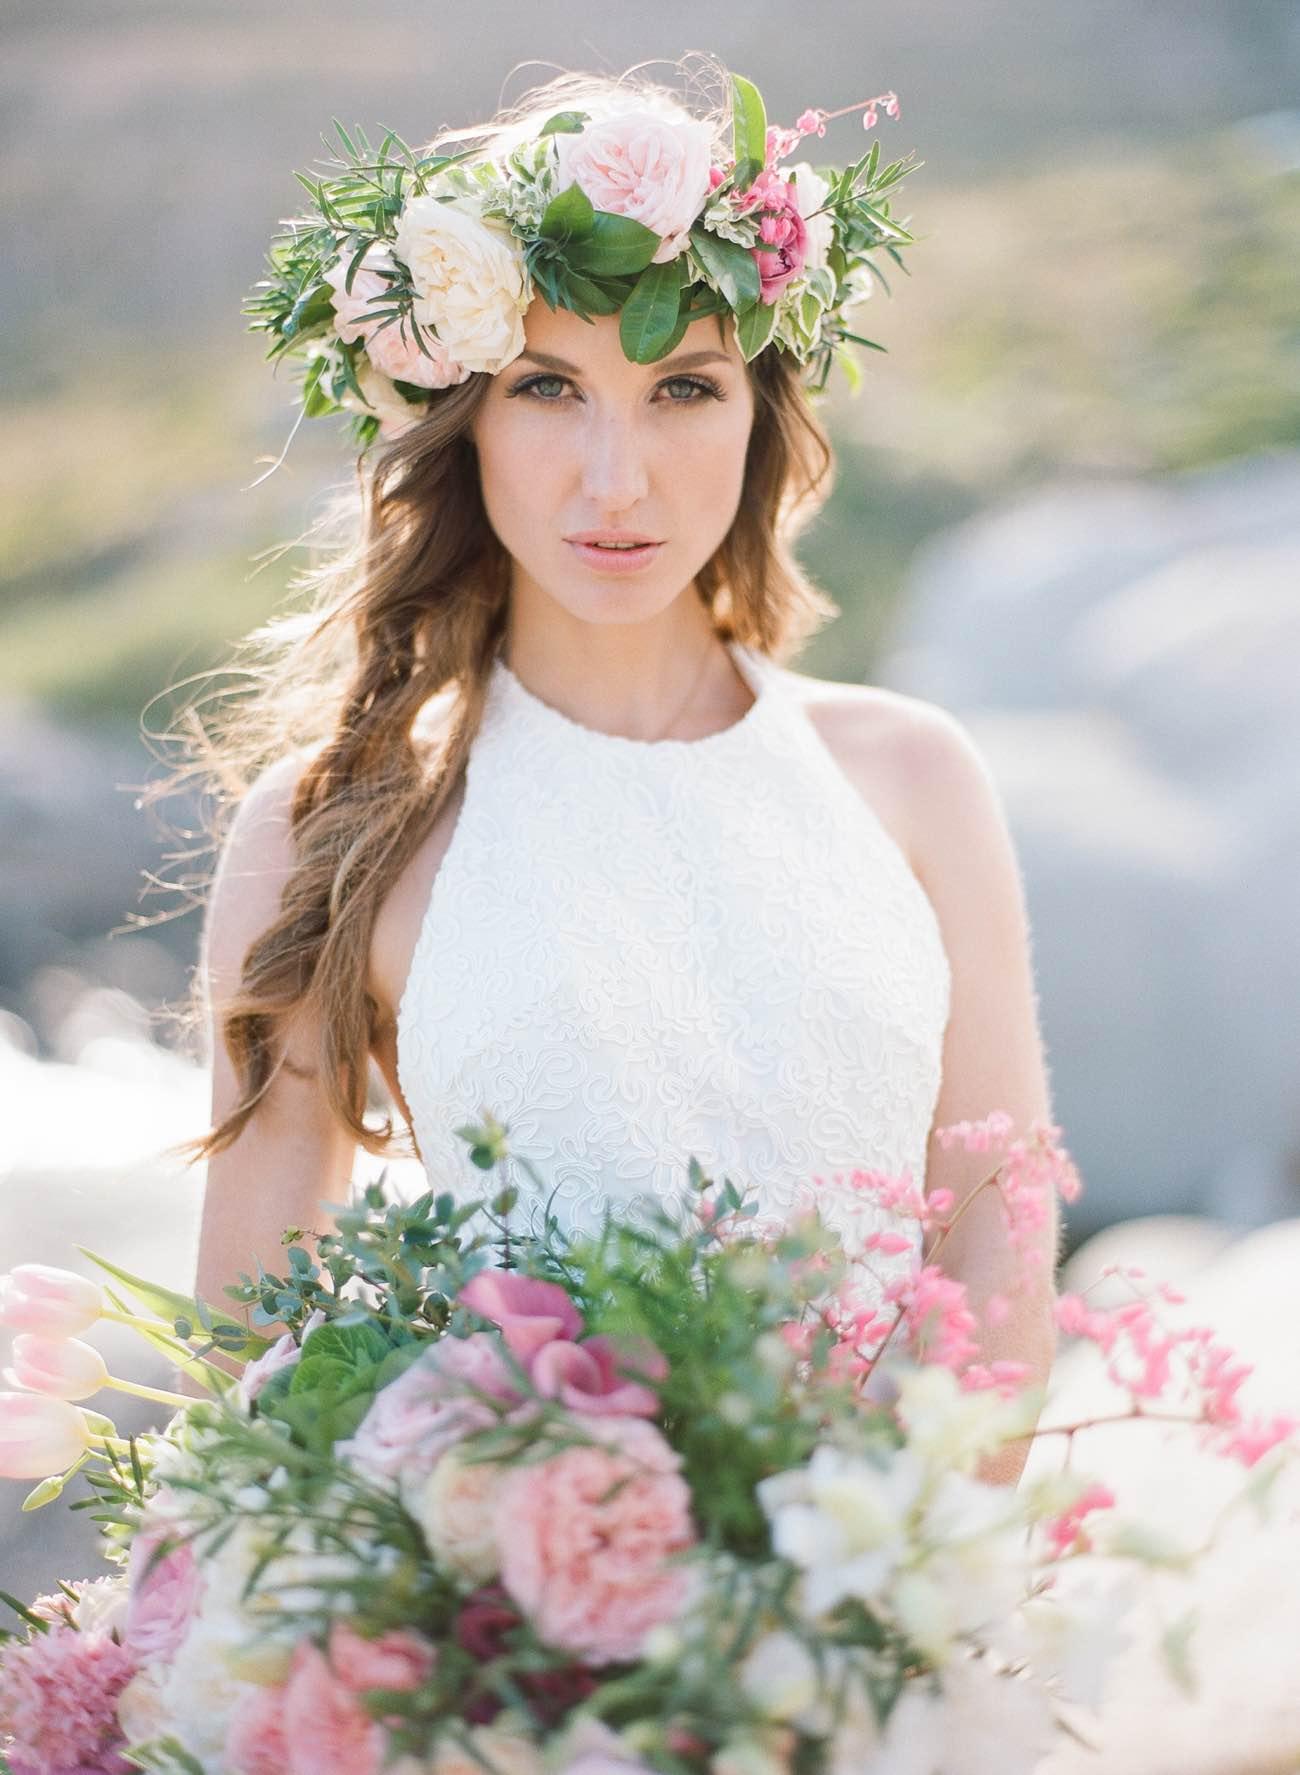 Romantic Cape Town Beach Bride - Emily Katharine Photography